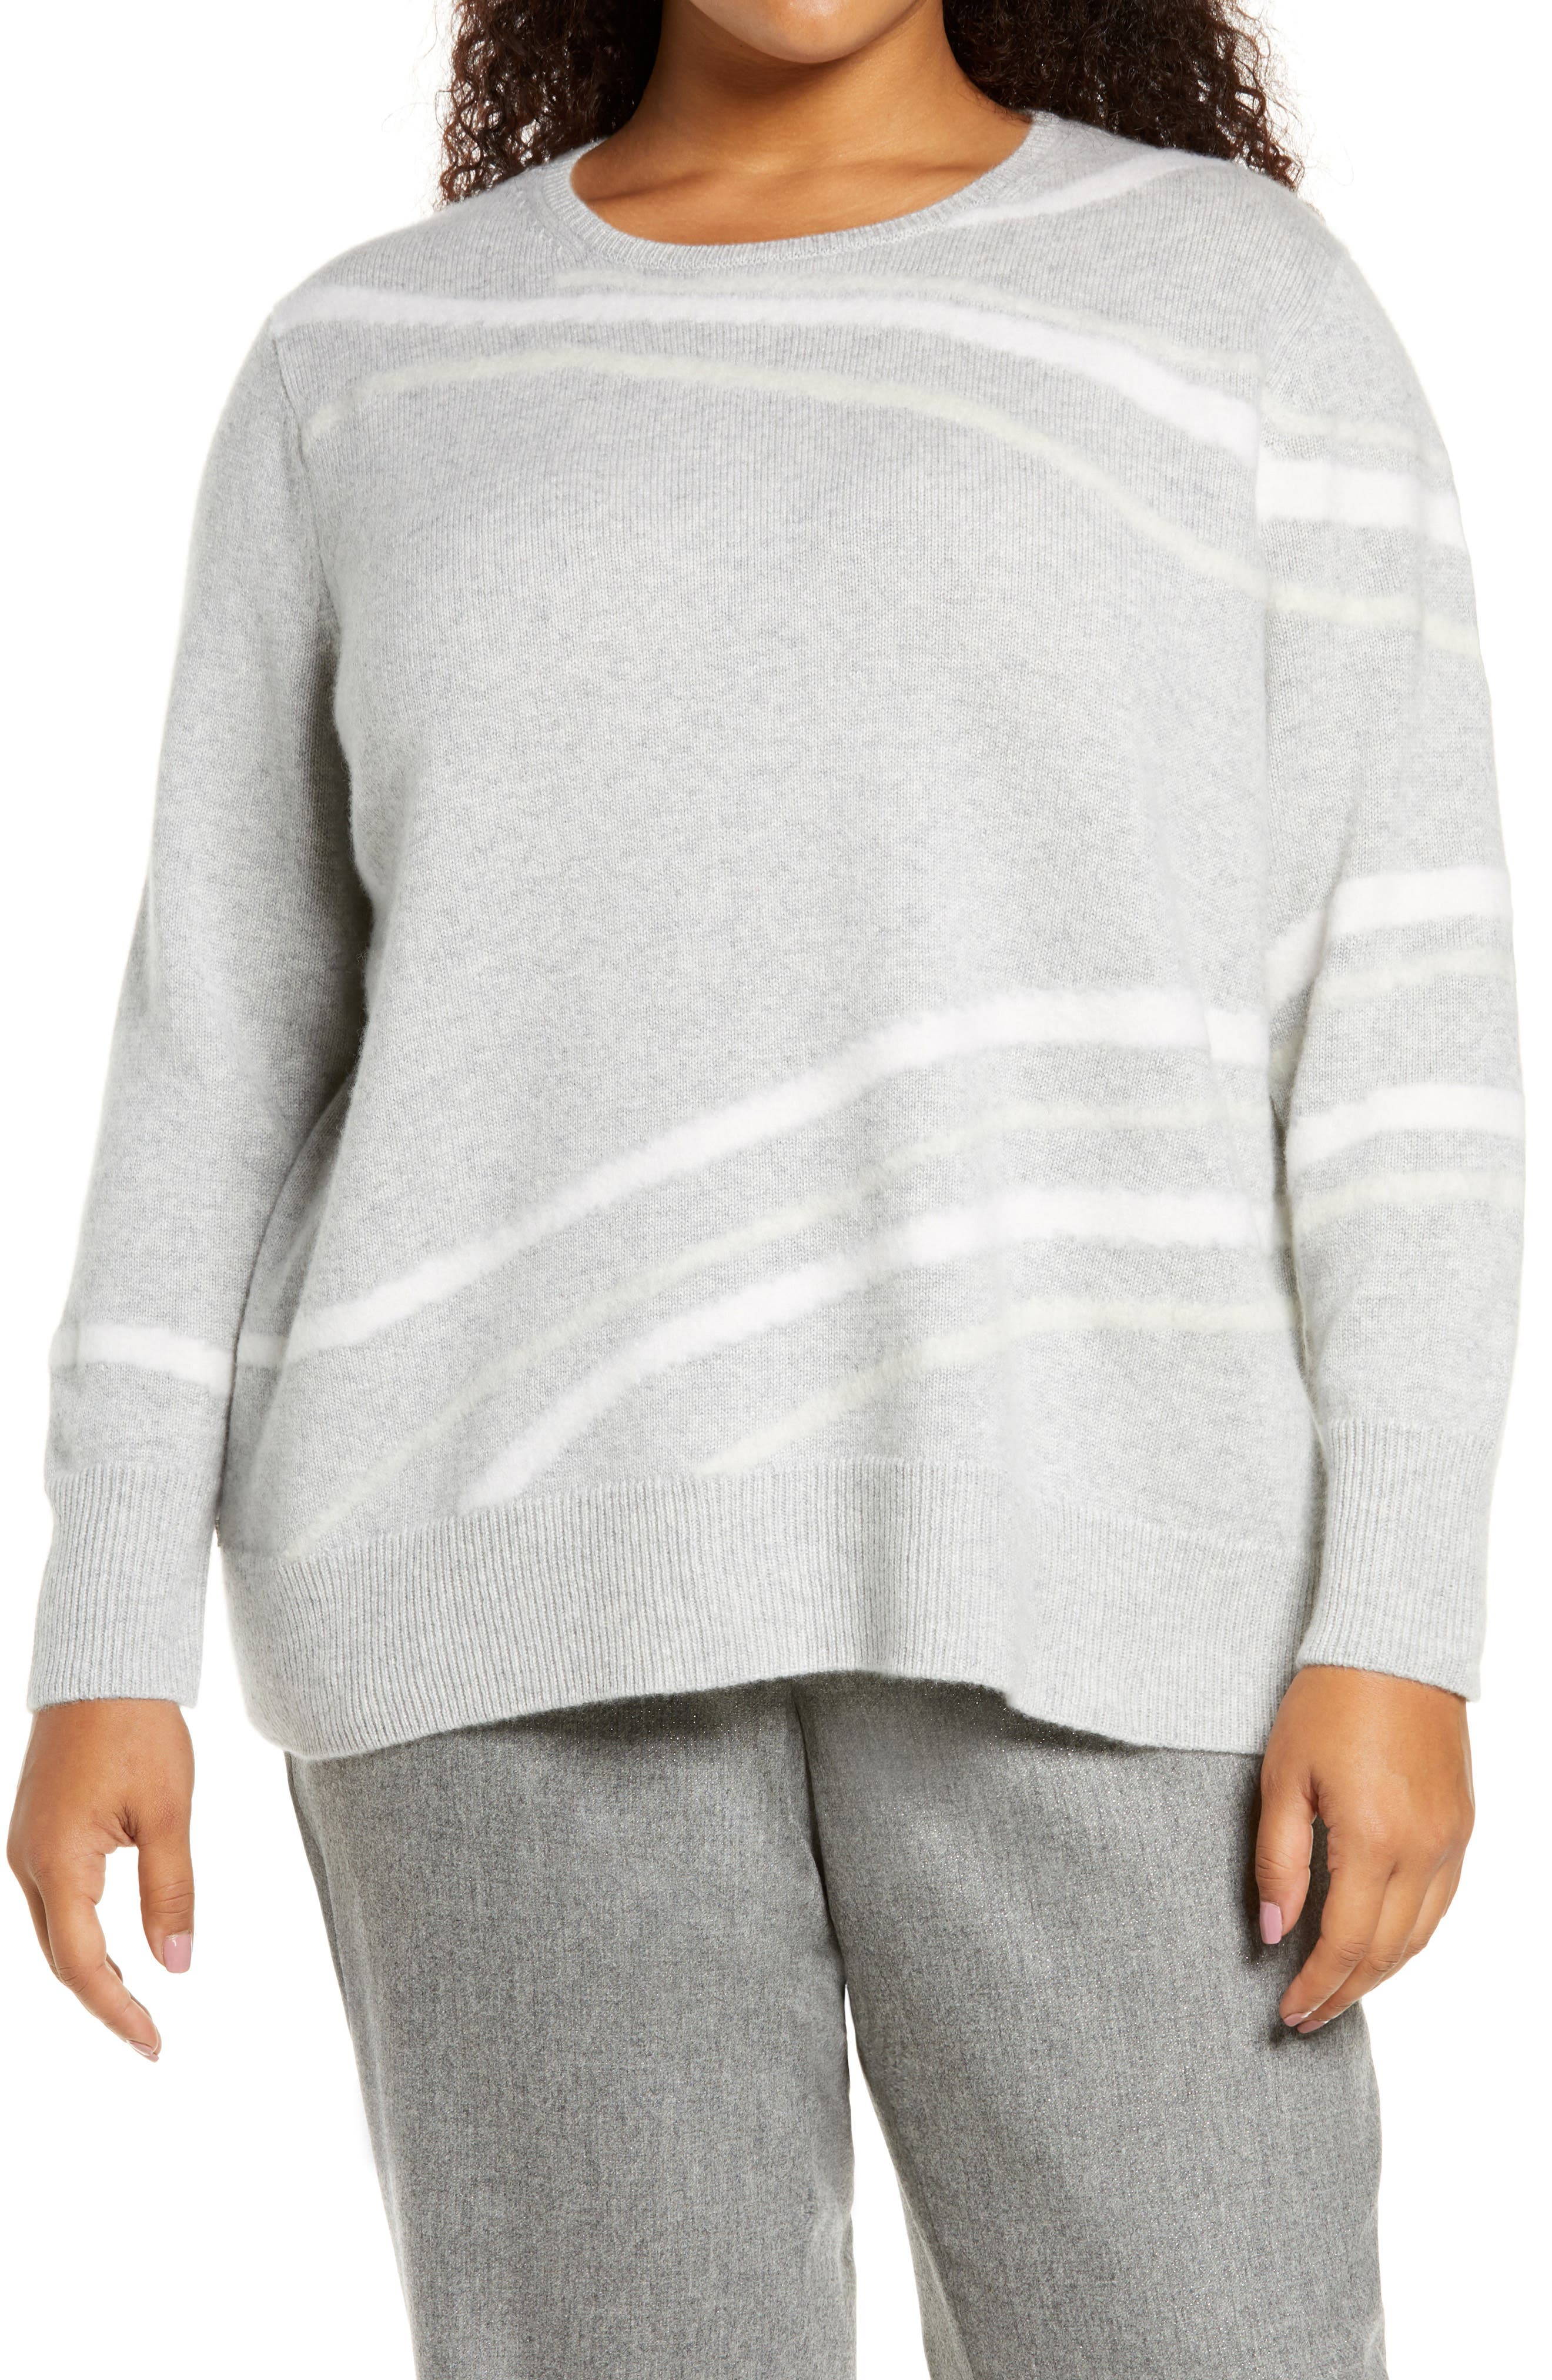 Image of Lafayette 148 New York Needle Punch Cashmere Sweater